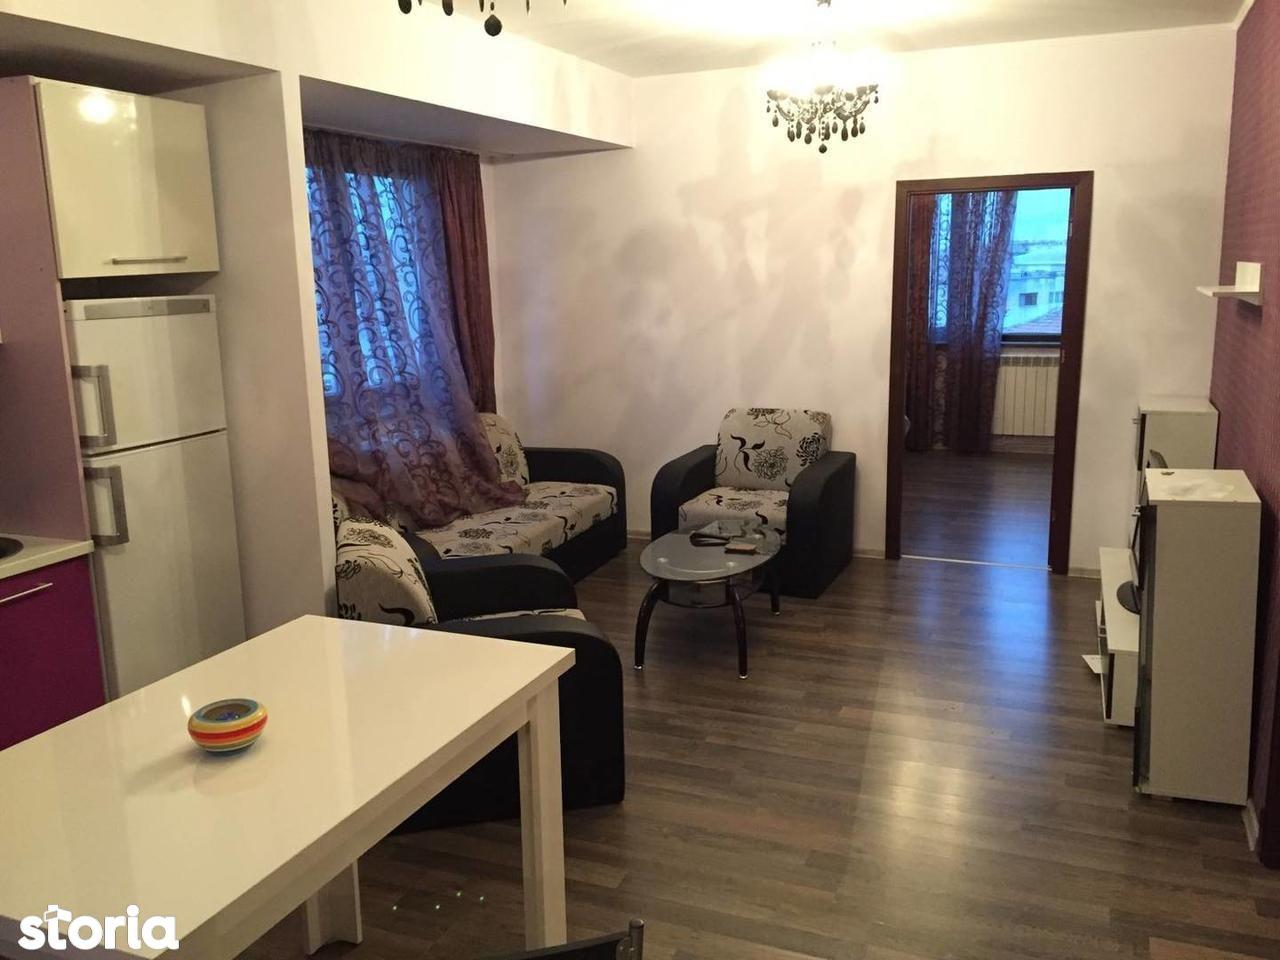 Apartament de vanzare, Constanța (judet), Bulevardul 1 Decembrie 1918 - Foto 2